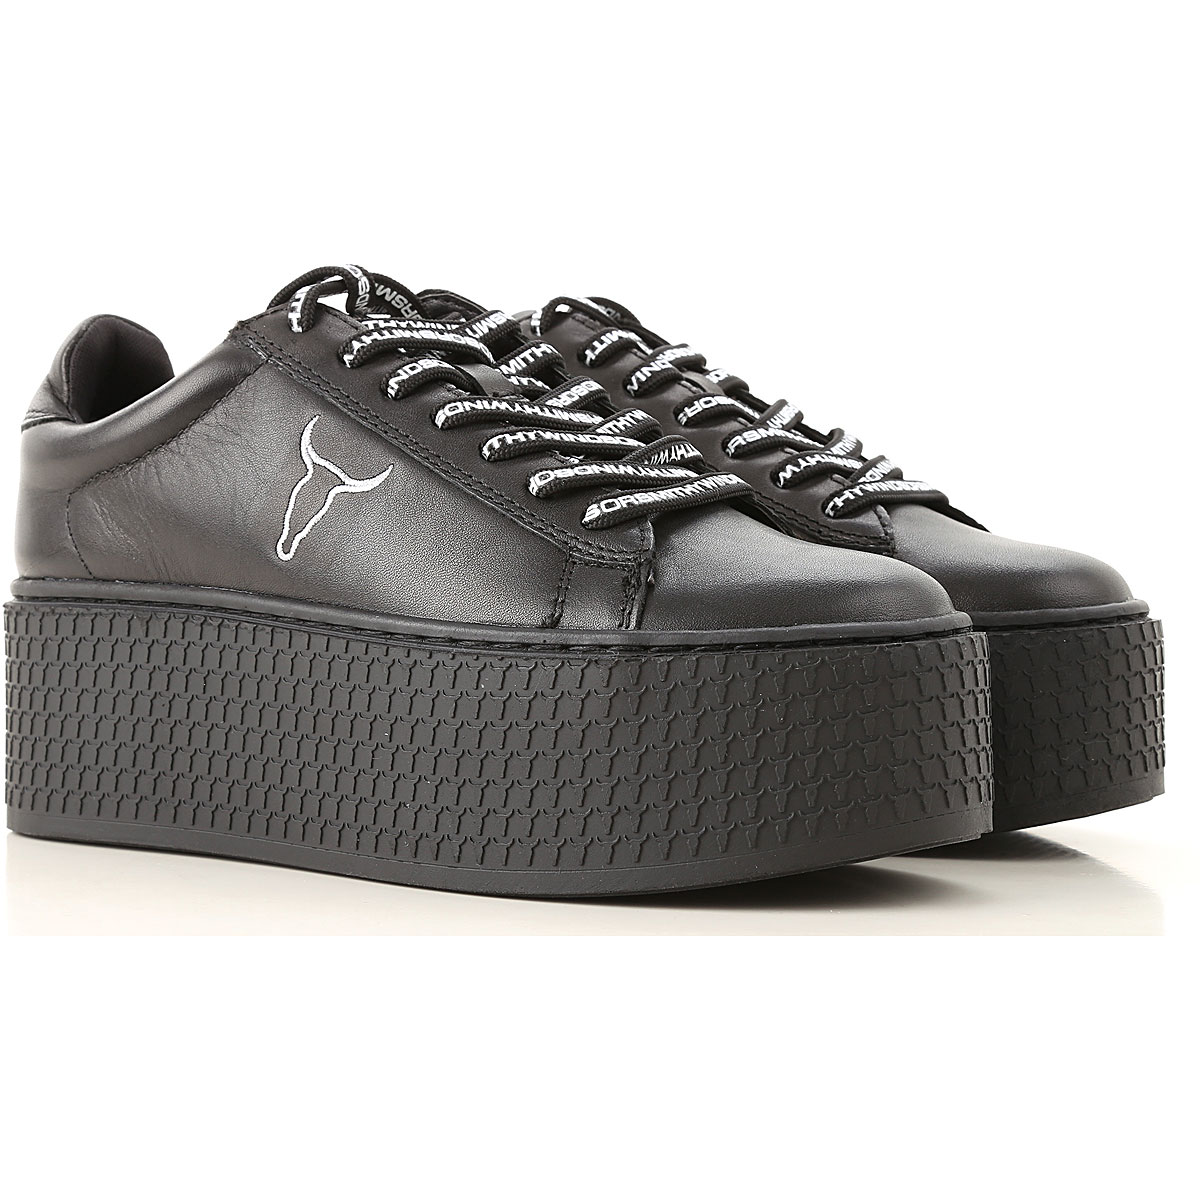 Image of Windsor Smith Sneakers for Women, Black, Leather, 2017, US 5 (EU 36) US 7 (EU 38) US 8 (EU 39) US 9 (EU 40)